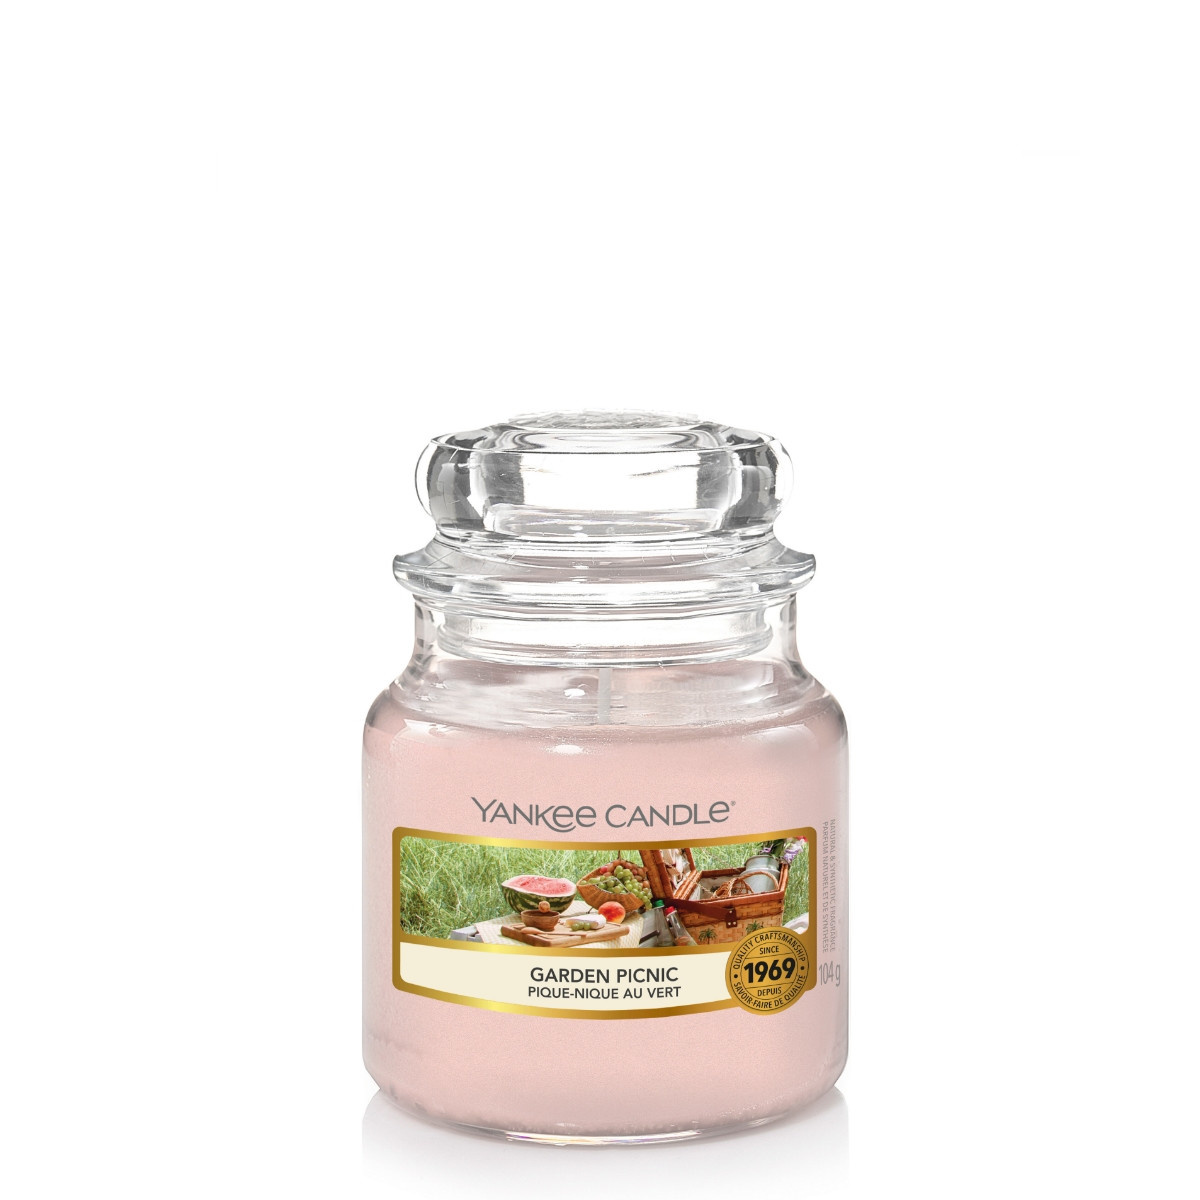 Yankee Candle Garden Picnic - Small Jar